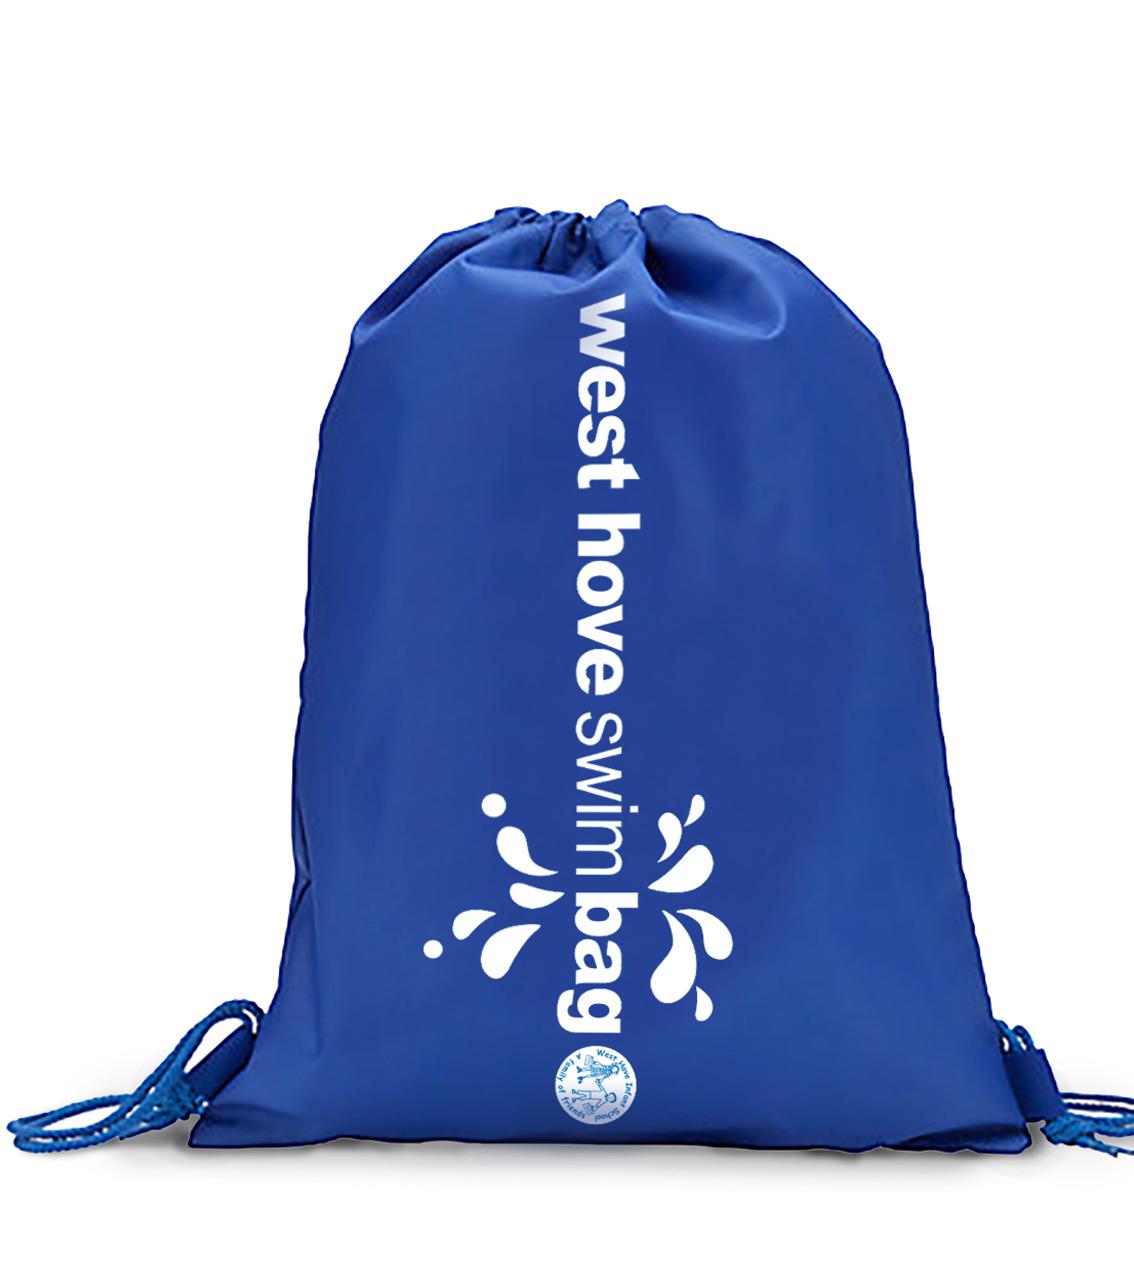 Swim bag design